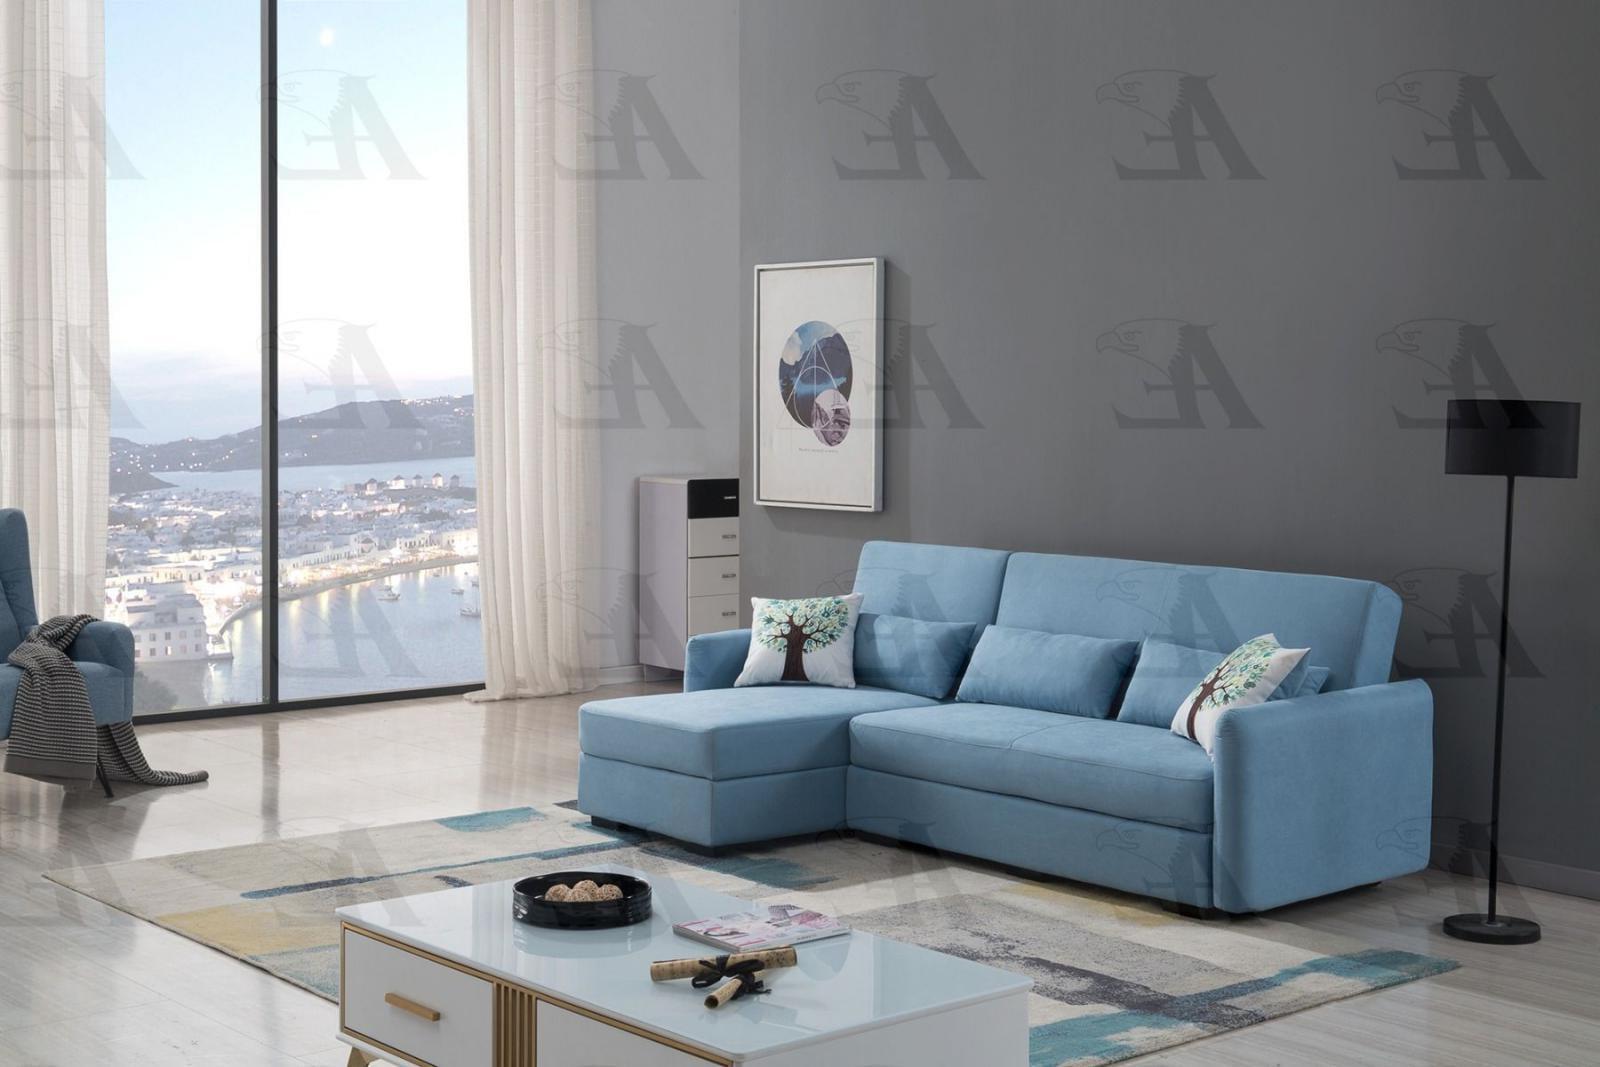 Blue Velvet Sectional Sofa Bed W Storage Left Chaise American Eagle Ae Ld828 Walmart Com Walmart Com